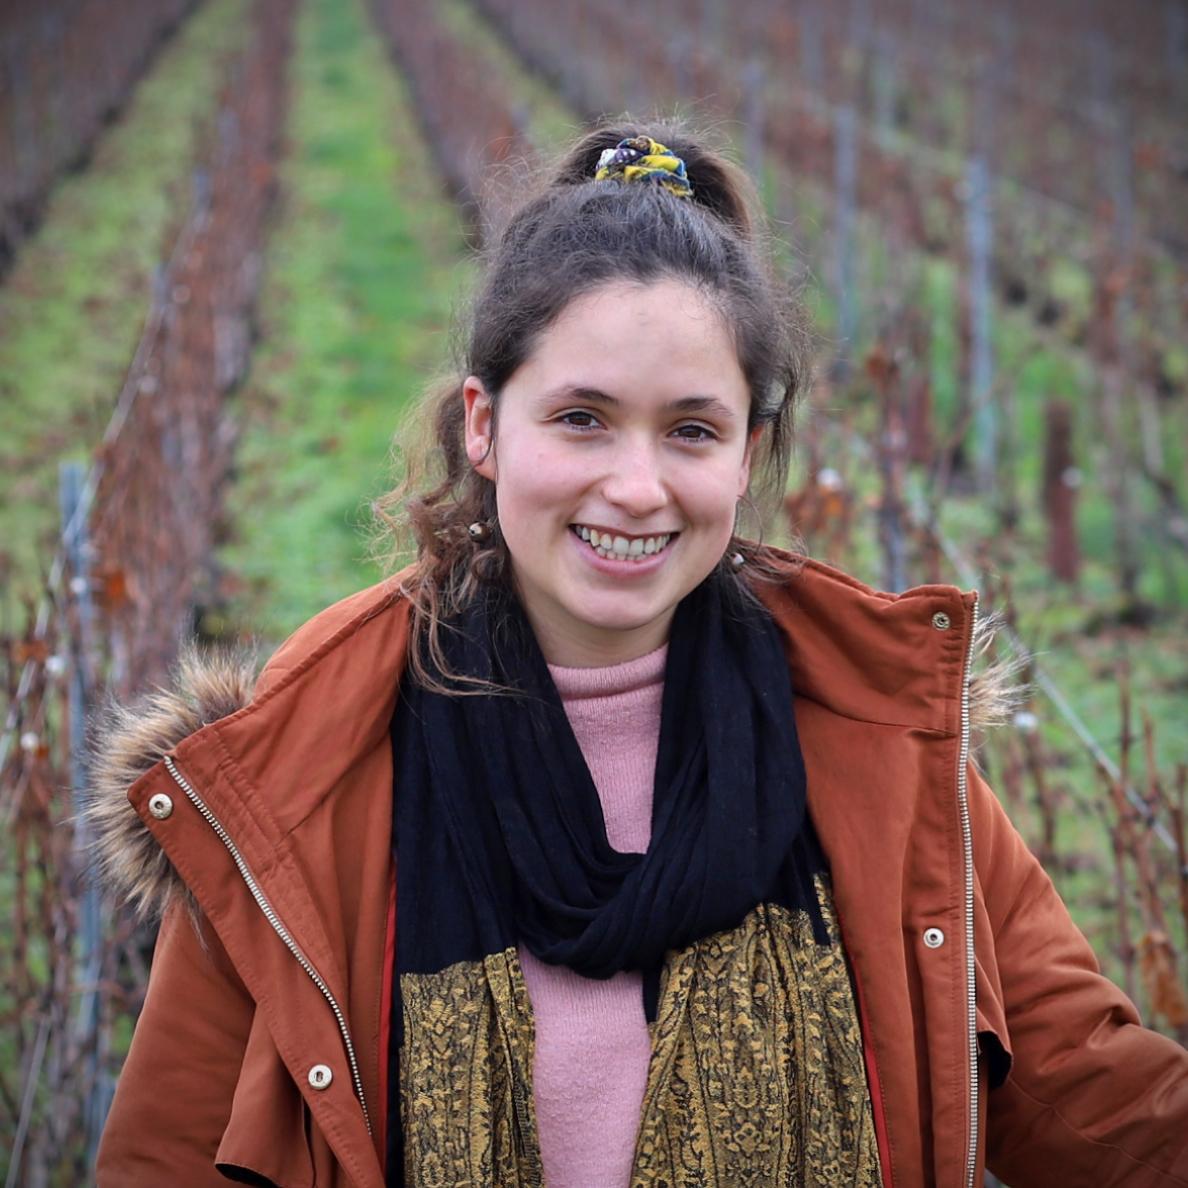 7-Tara SMIT-SADKI, ingénieur agronome, consultante viticole